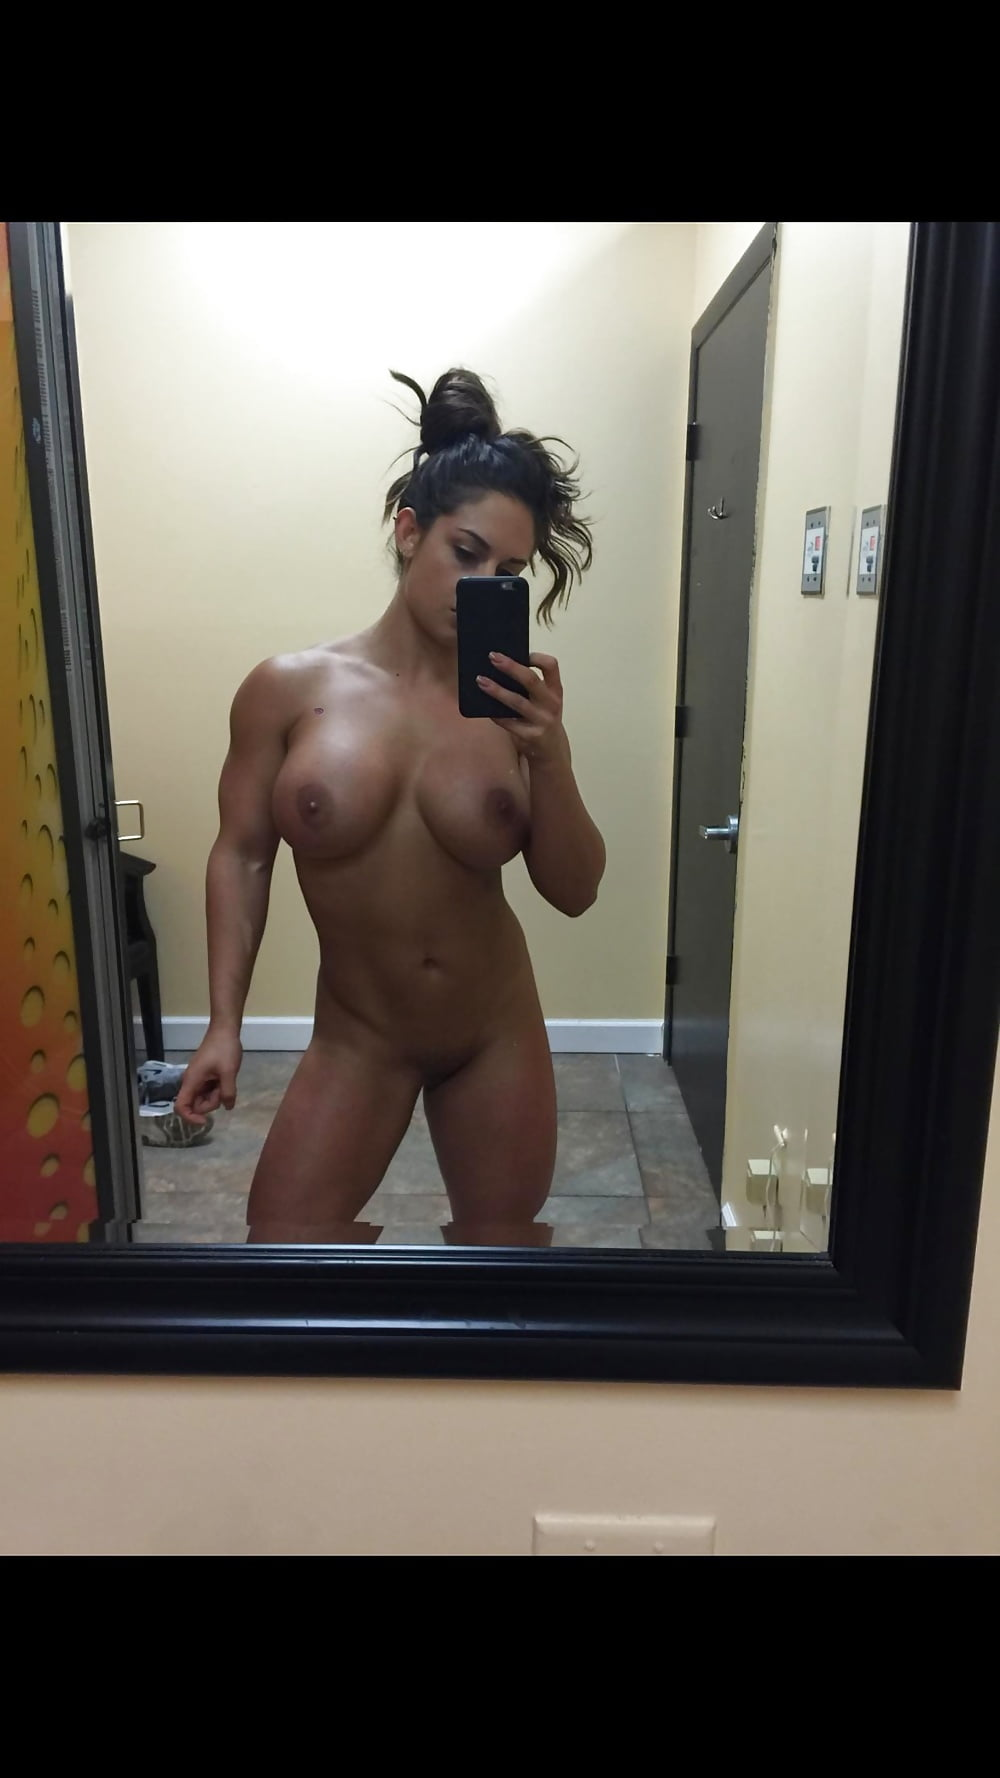 Melina durchgesickerte nudes